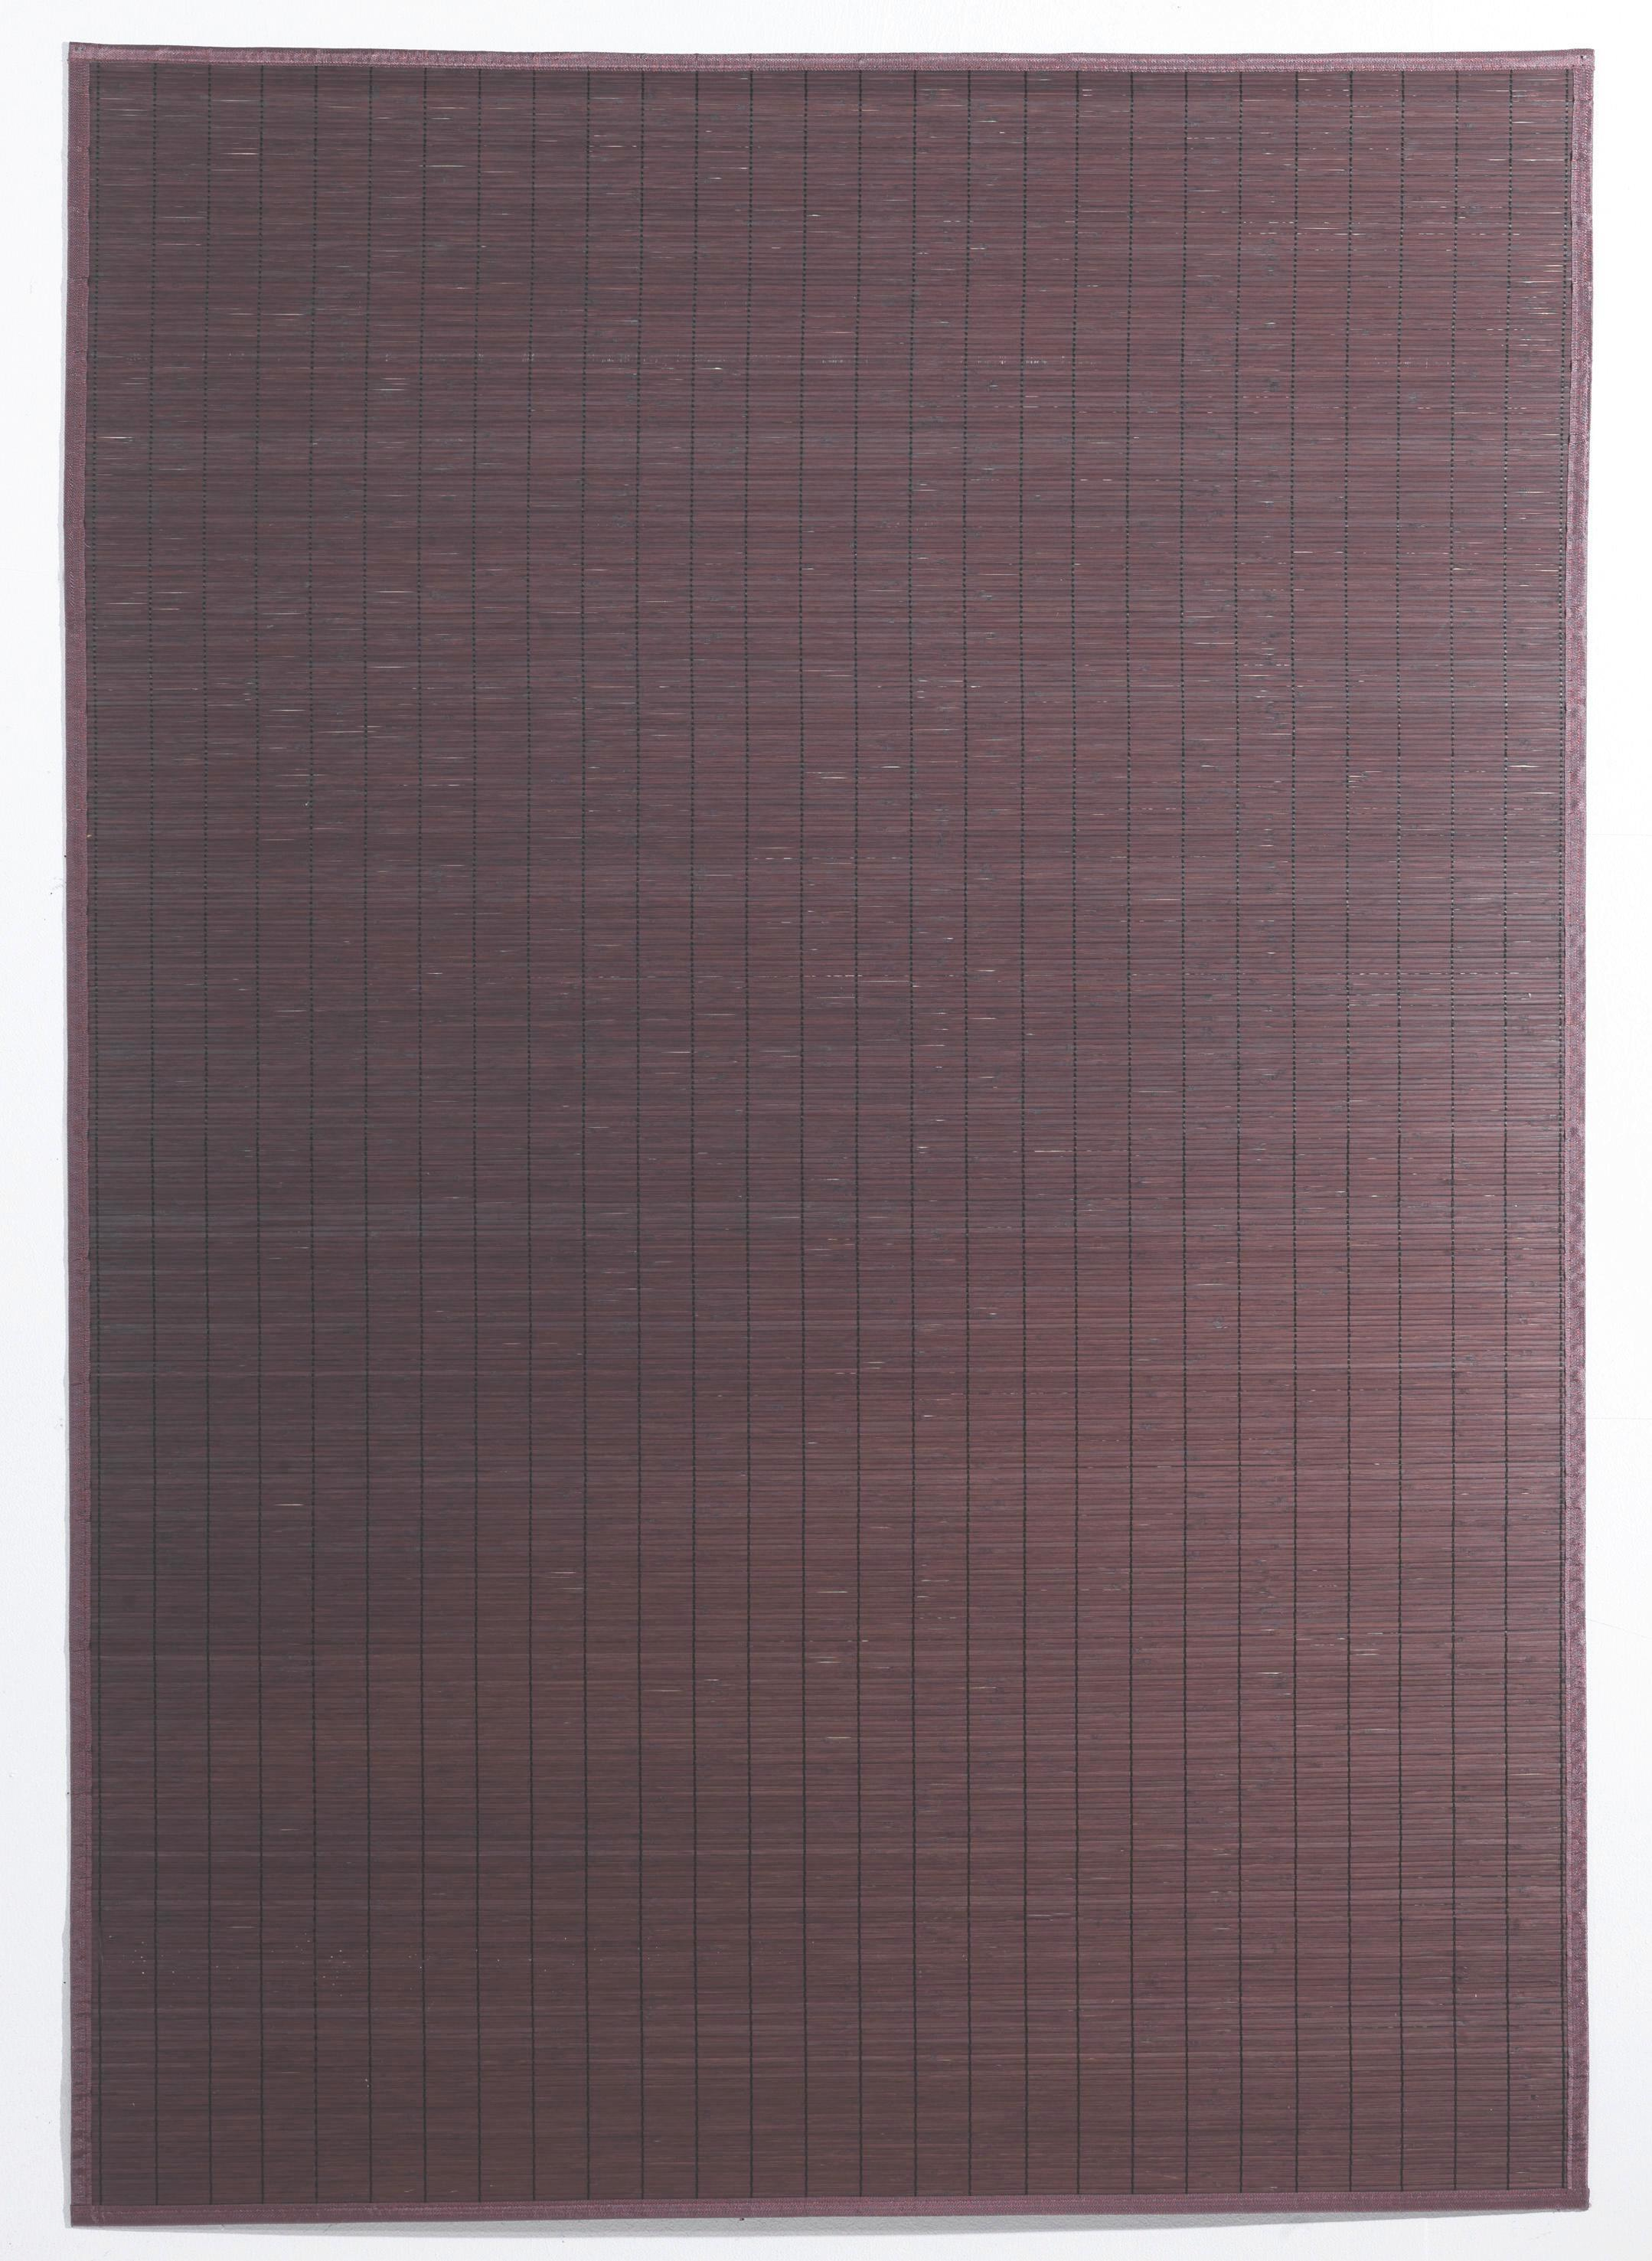 ROLÓ WOODY - sötétbarna, Lifestyle, fa (120/180cm) - MÖMAX modern living